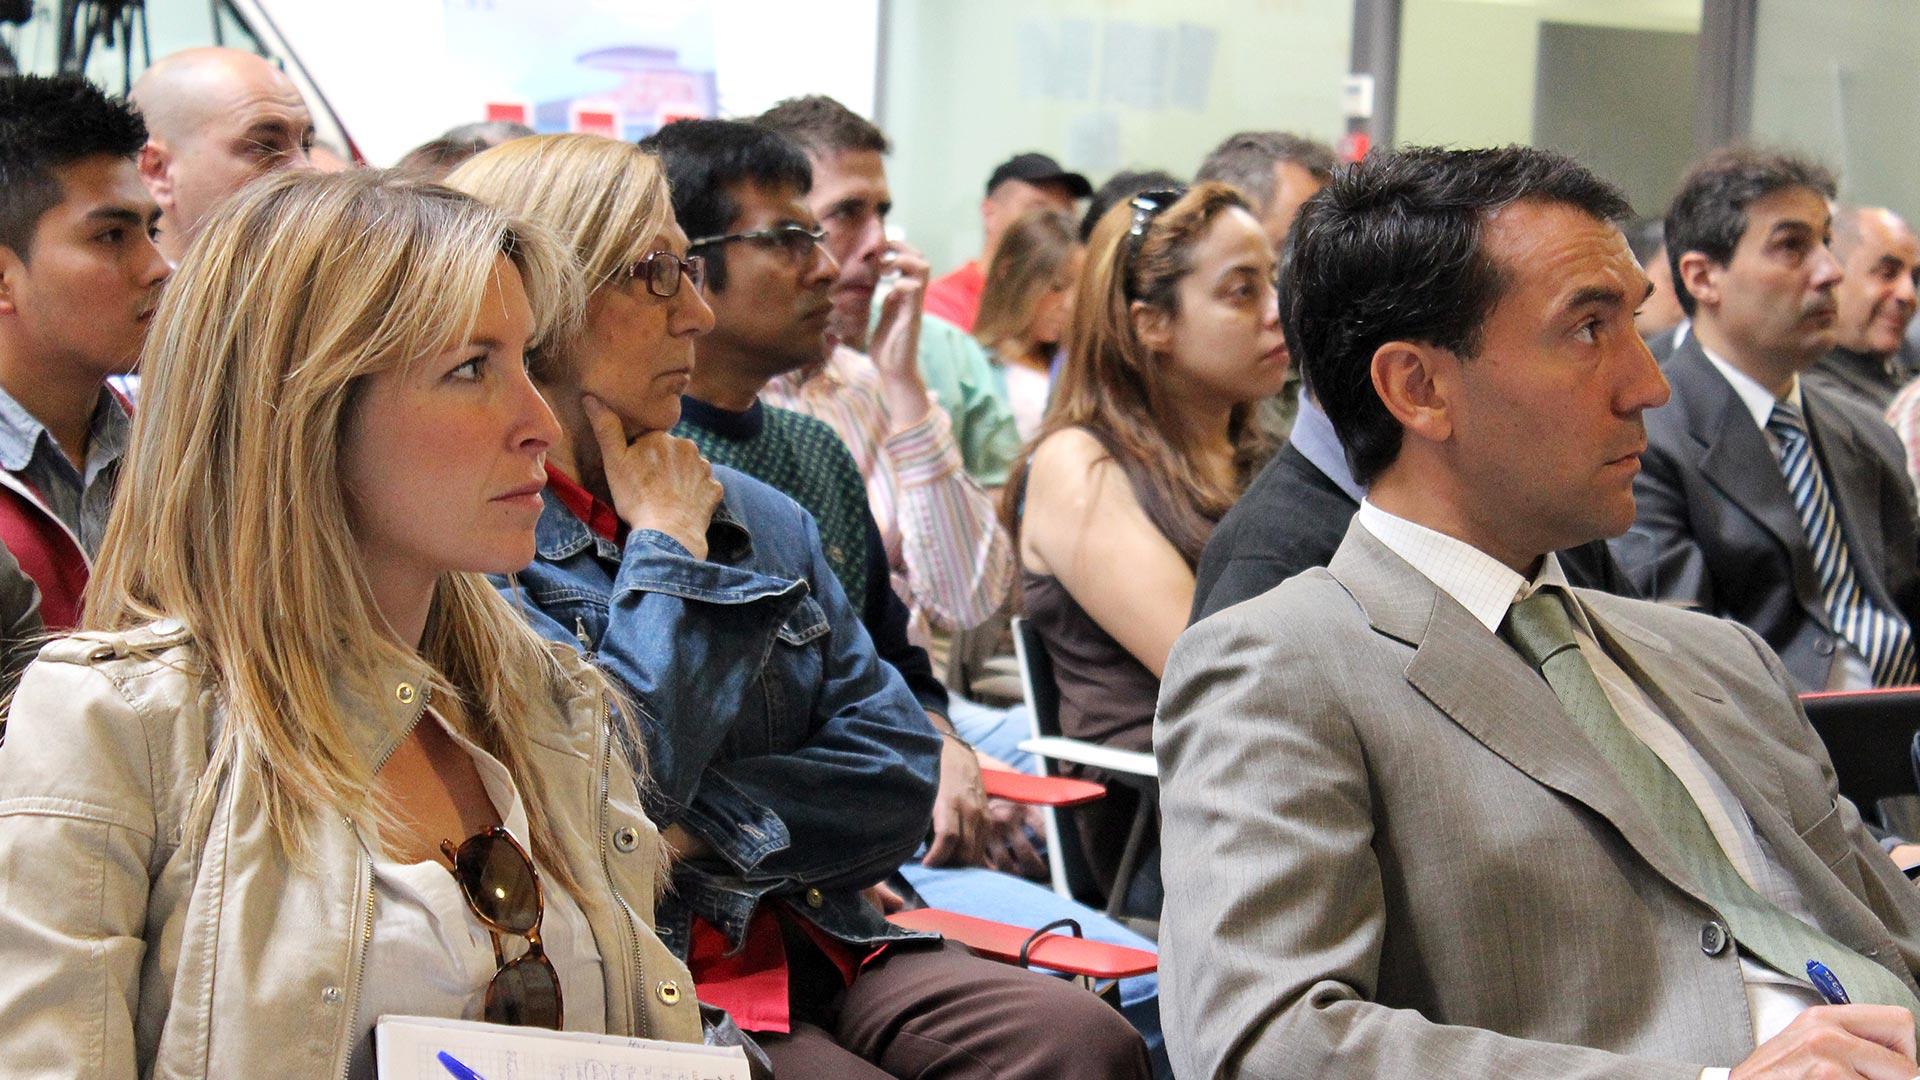 tpnet-eventos-encuentros-profesionales-iot-publico-4